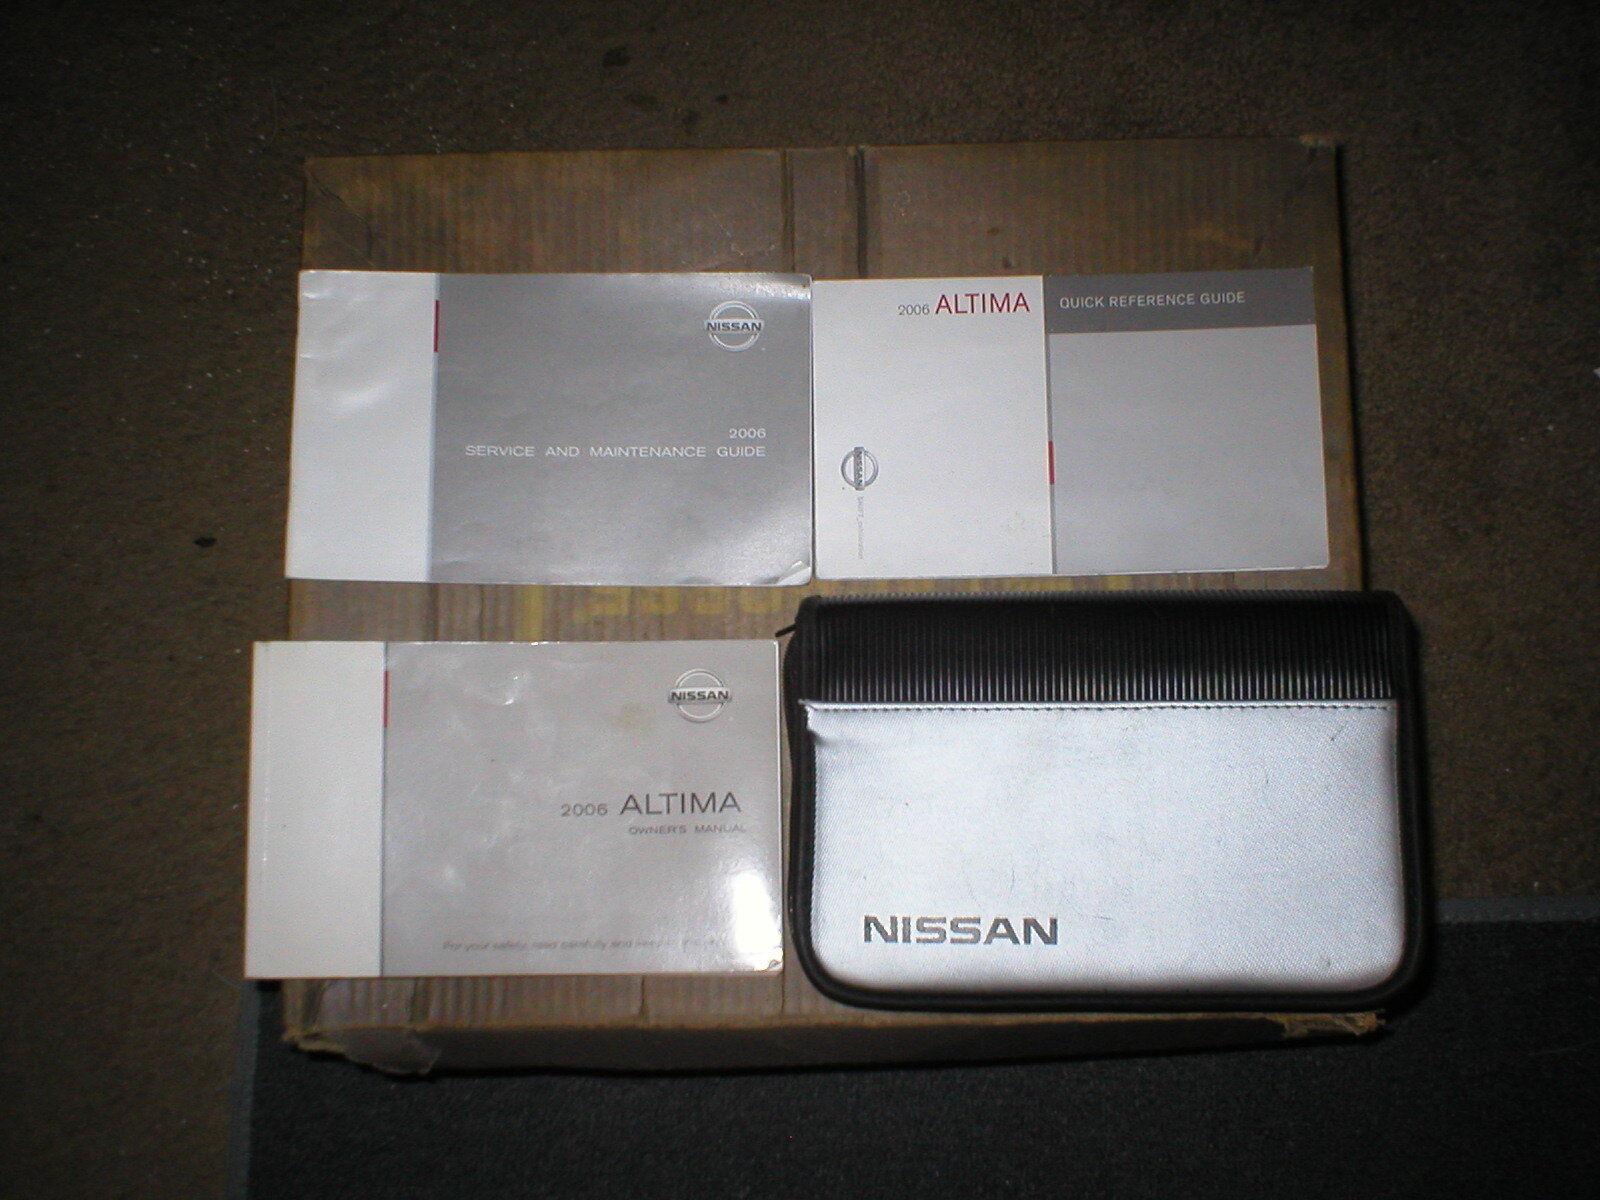 2006 nissan altima owner manual